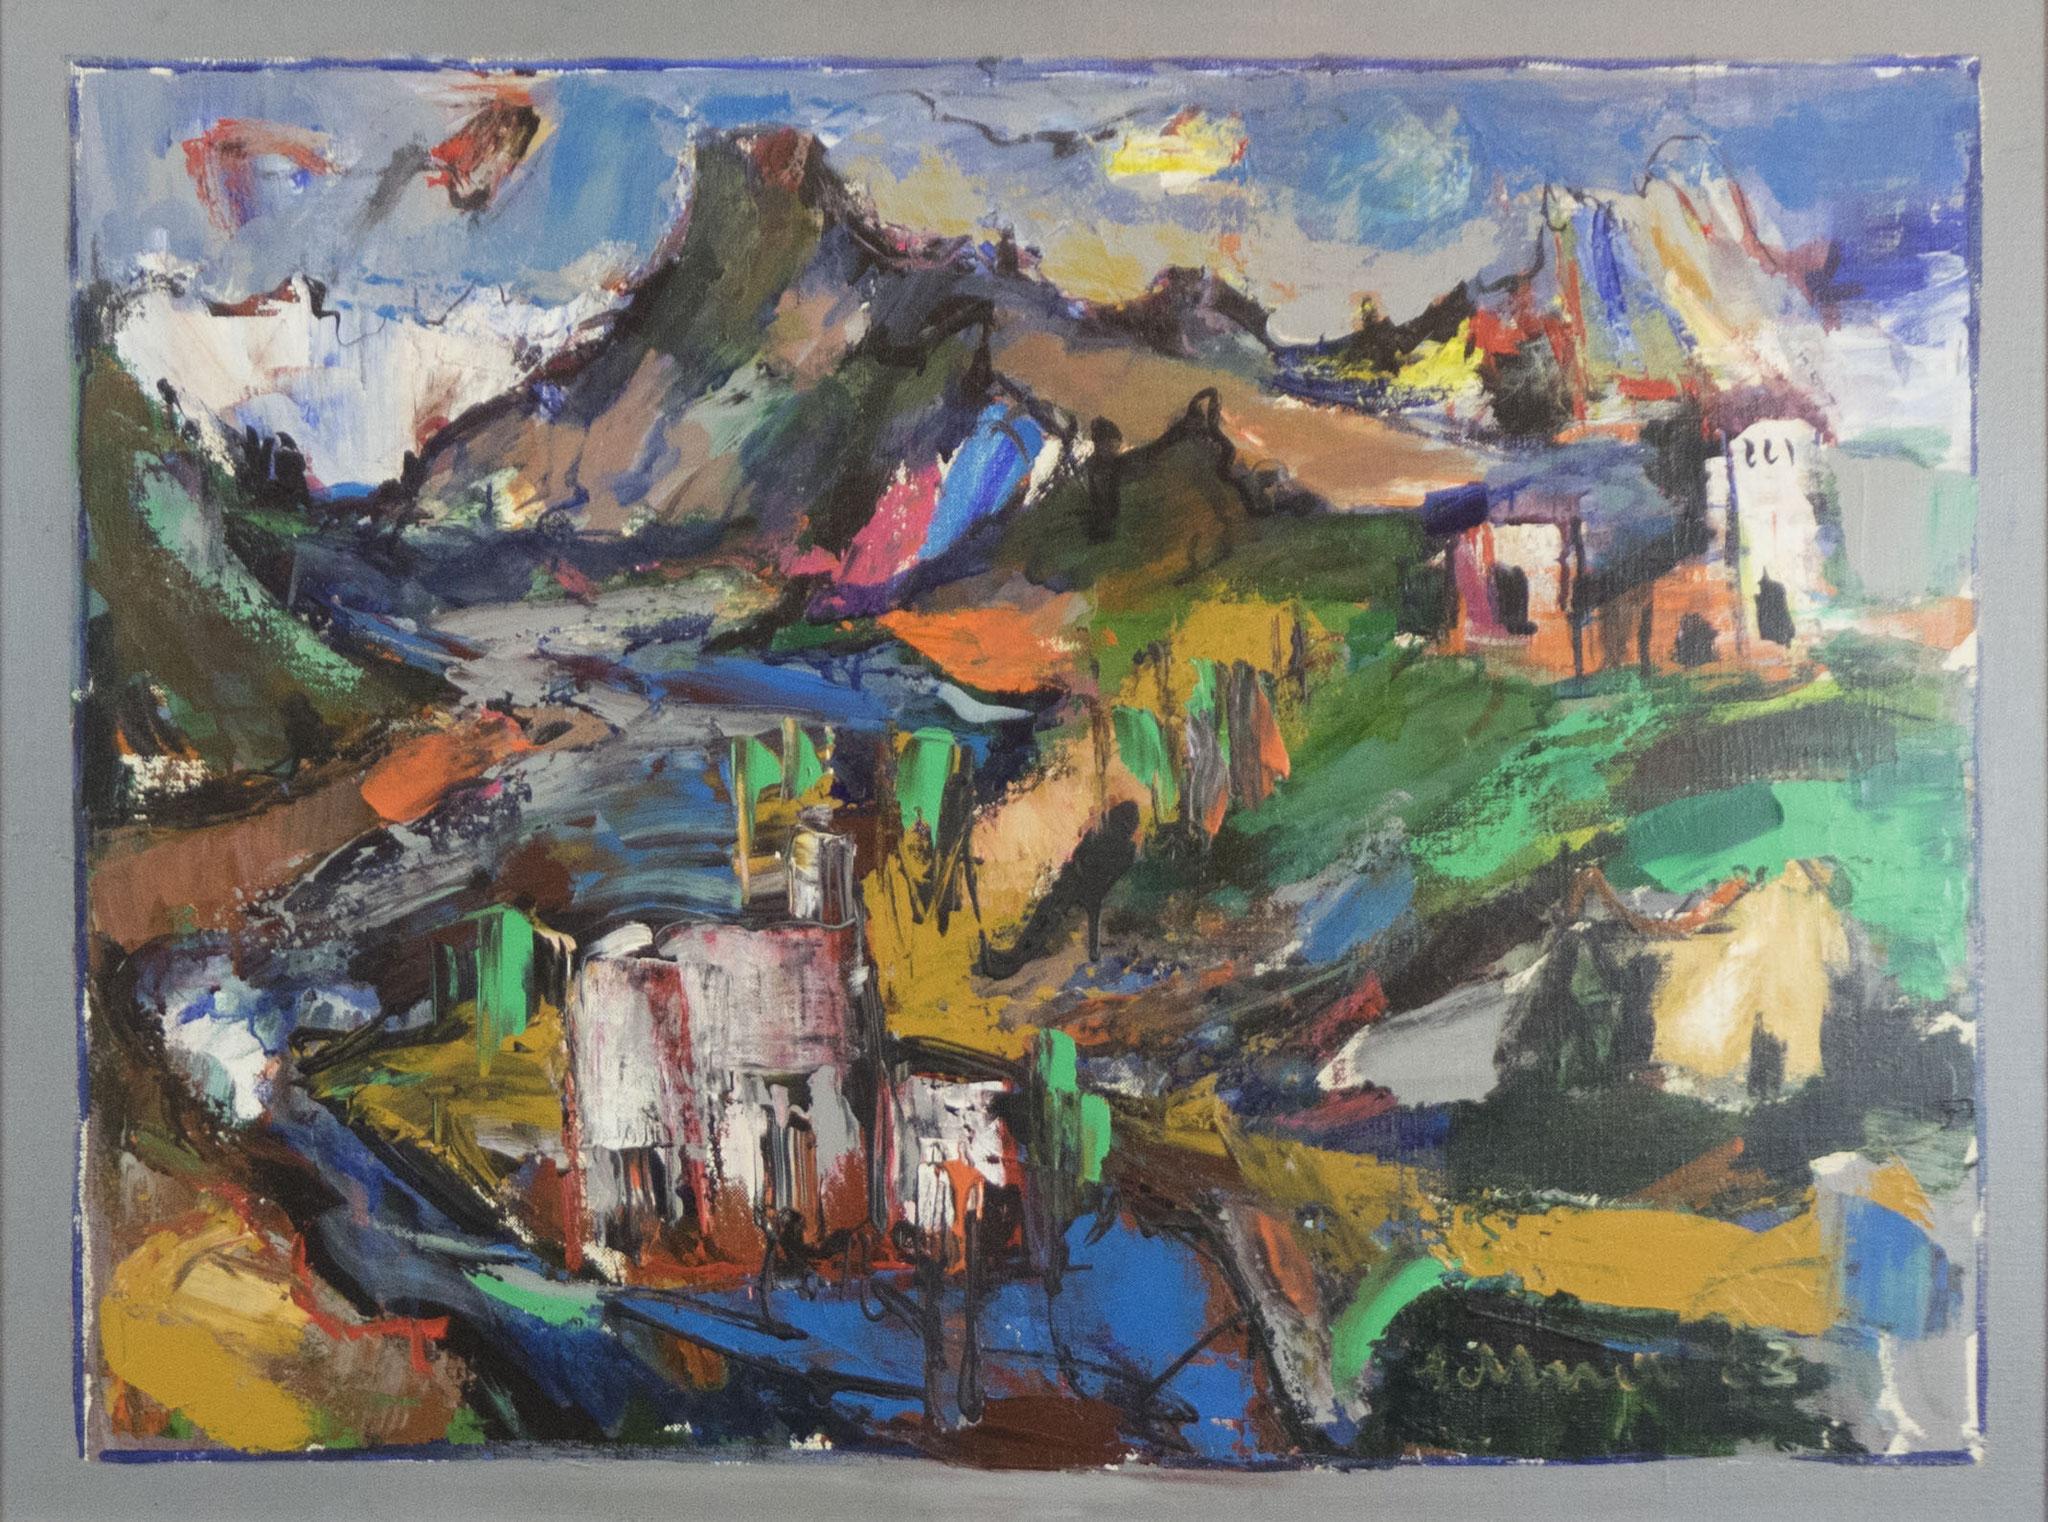 """Original Alpenbad"" 1983 - Acryl auf Leinwand - 80x60 cm"